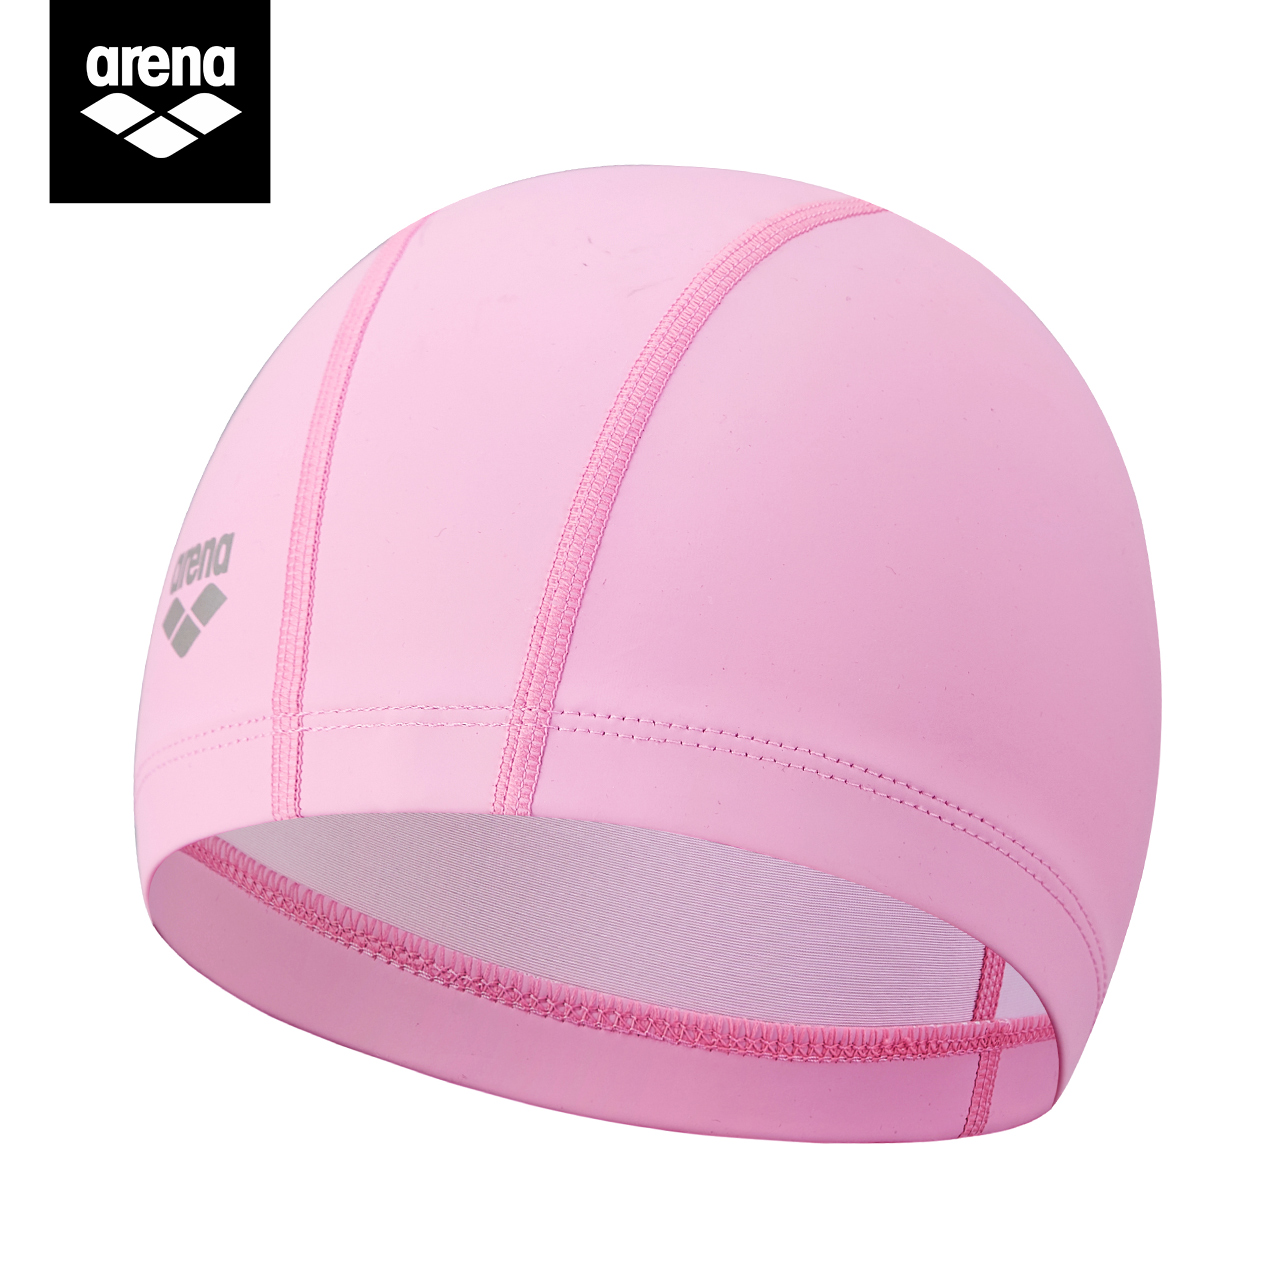 arena阿瑞娜双材质泳帽女高弹不勒头长发游泳装备成人男士游泳帽